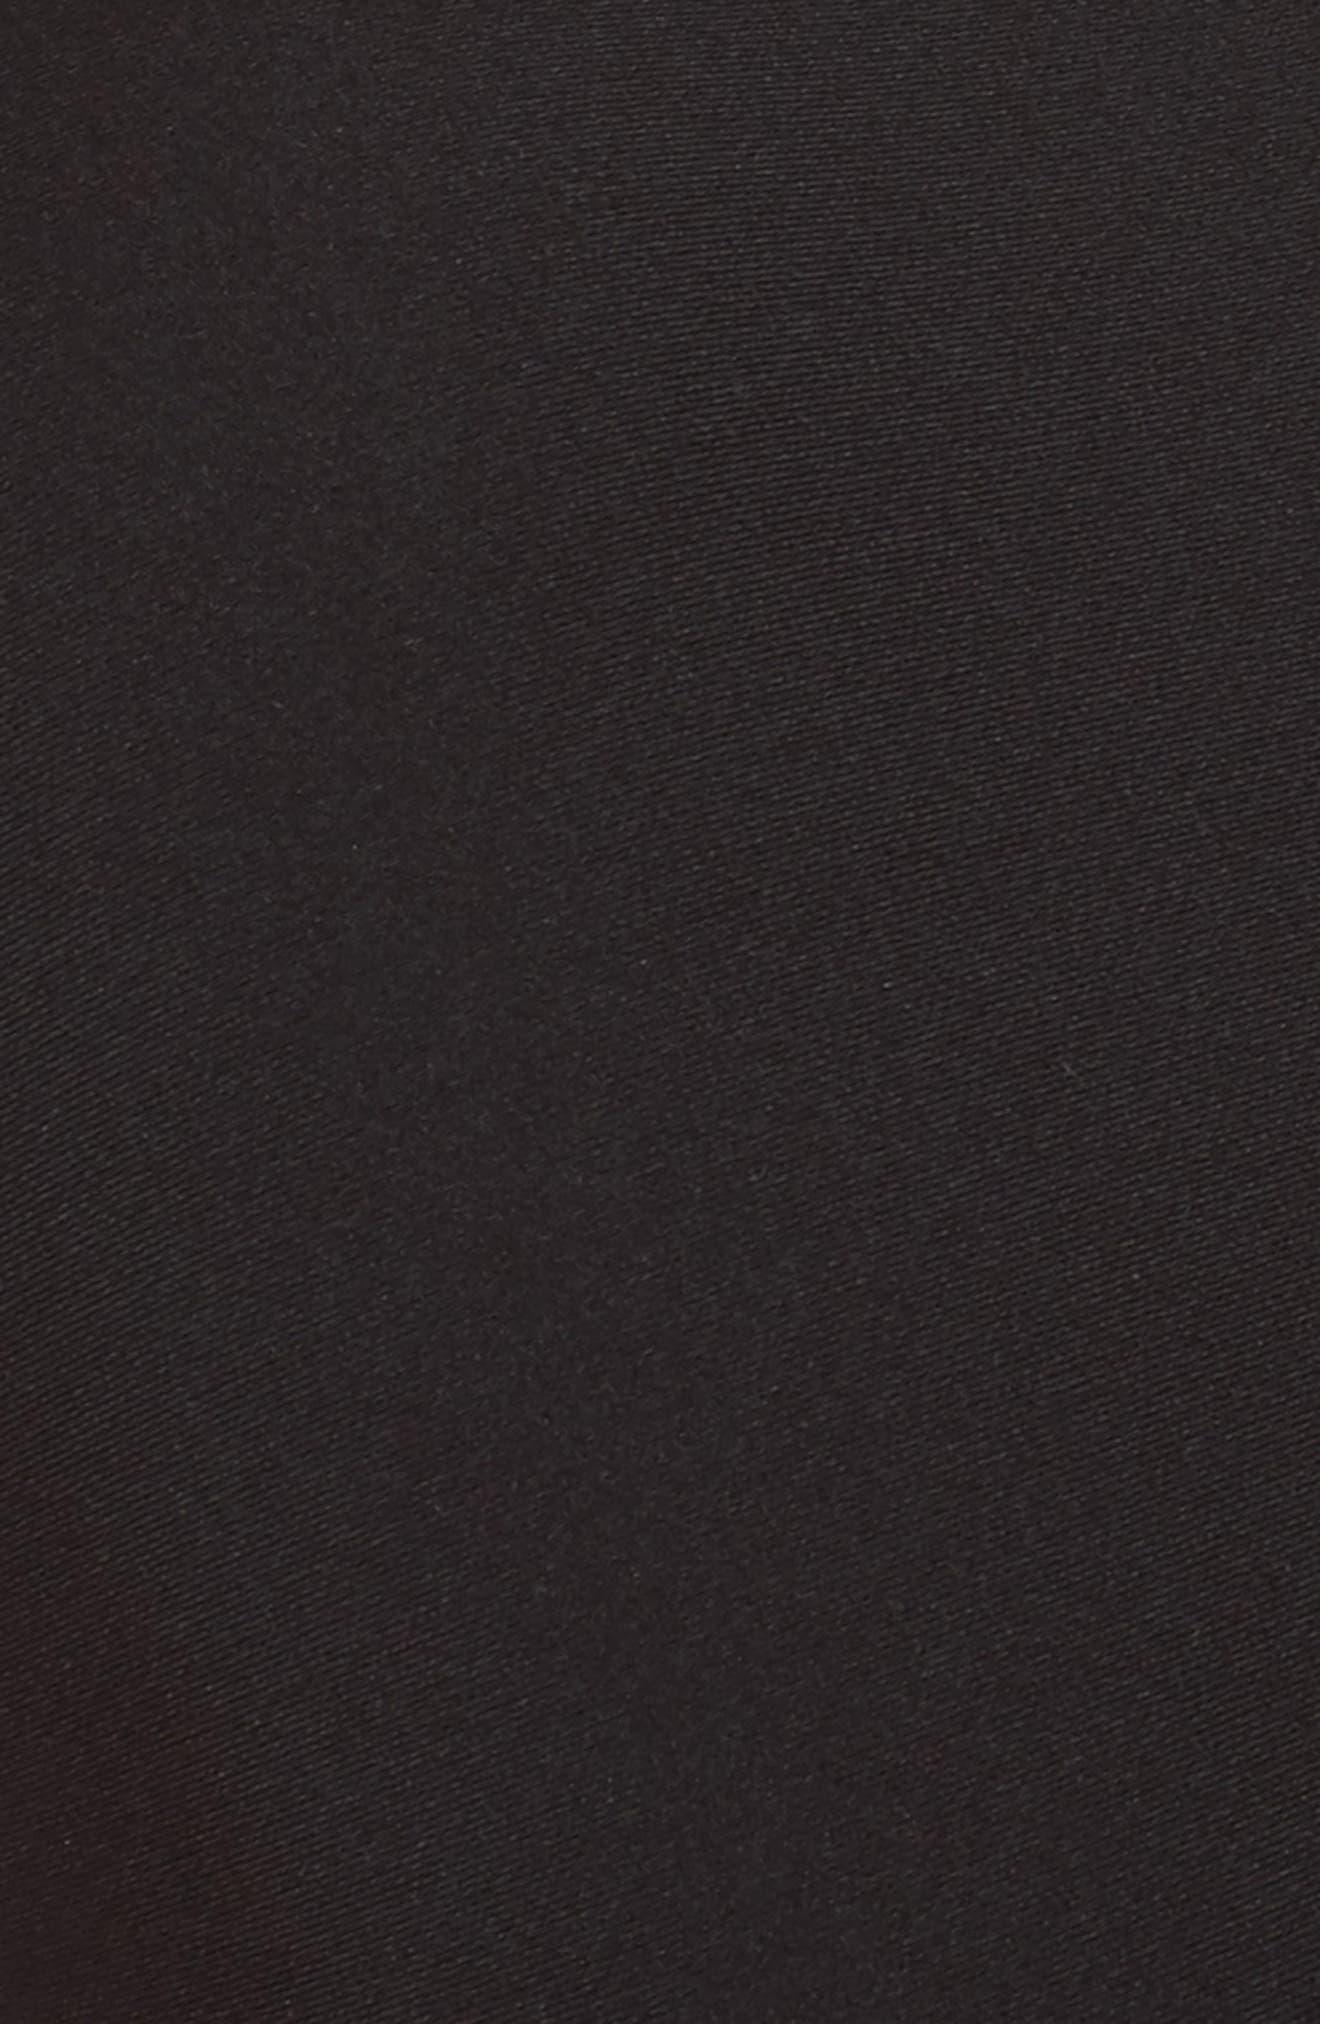 Abbot Sports Bra,                             Alternate thumbnail 5, color,                             Black